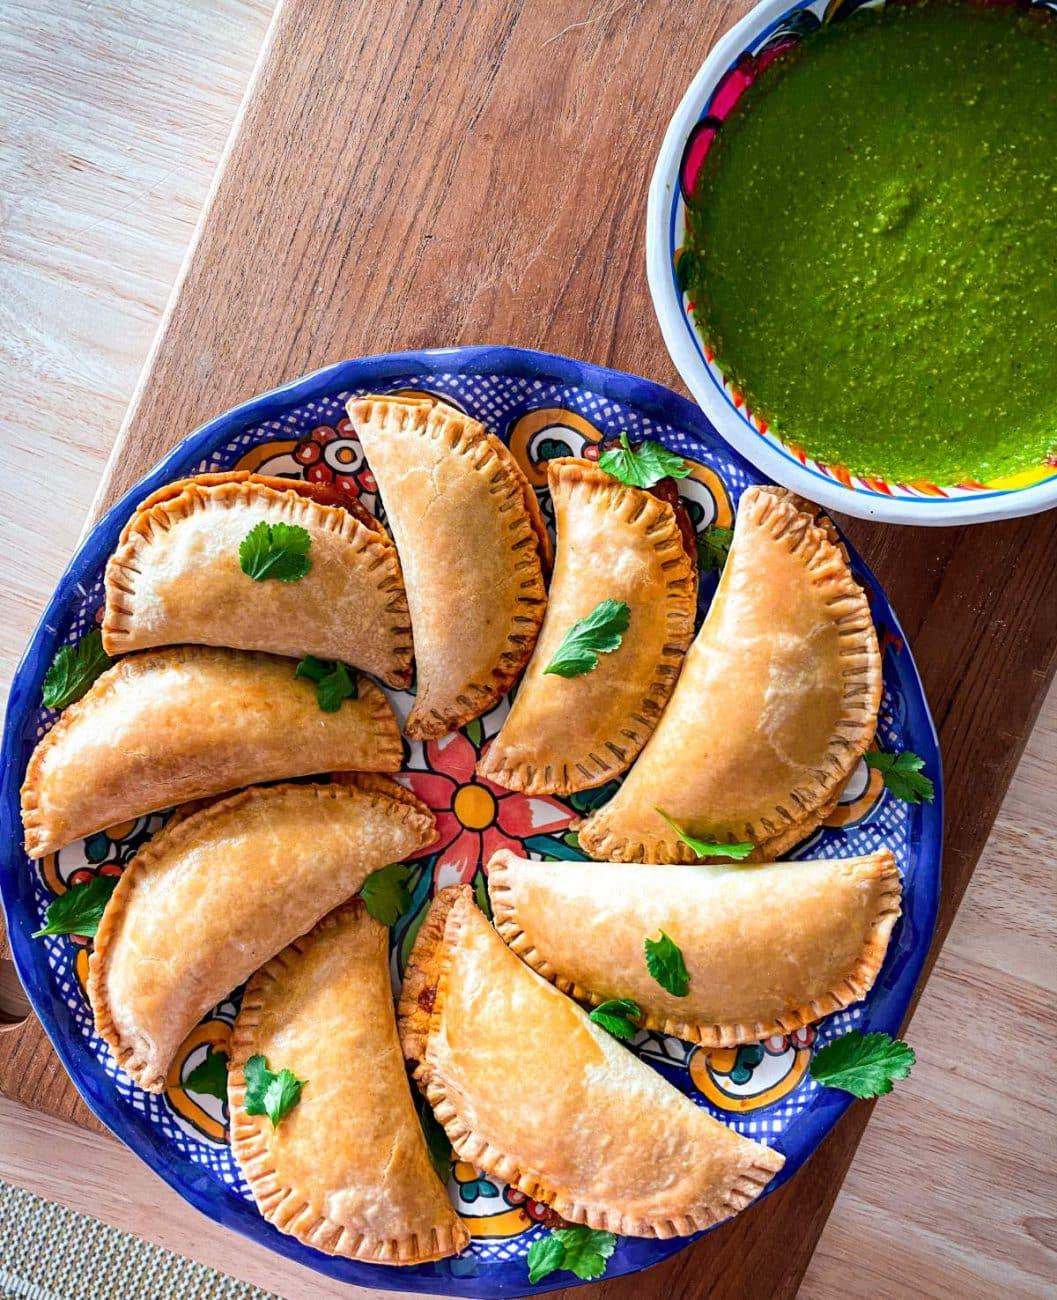 Oxtail Empanadas with Chimichurri Sauce